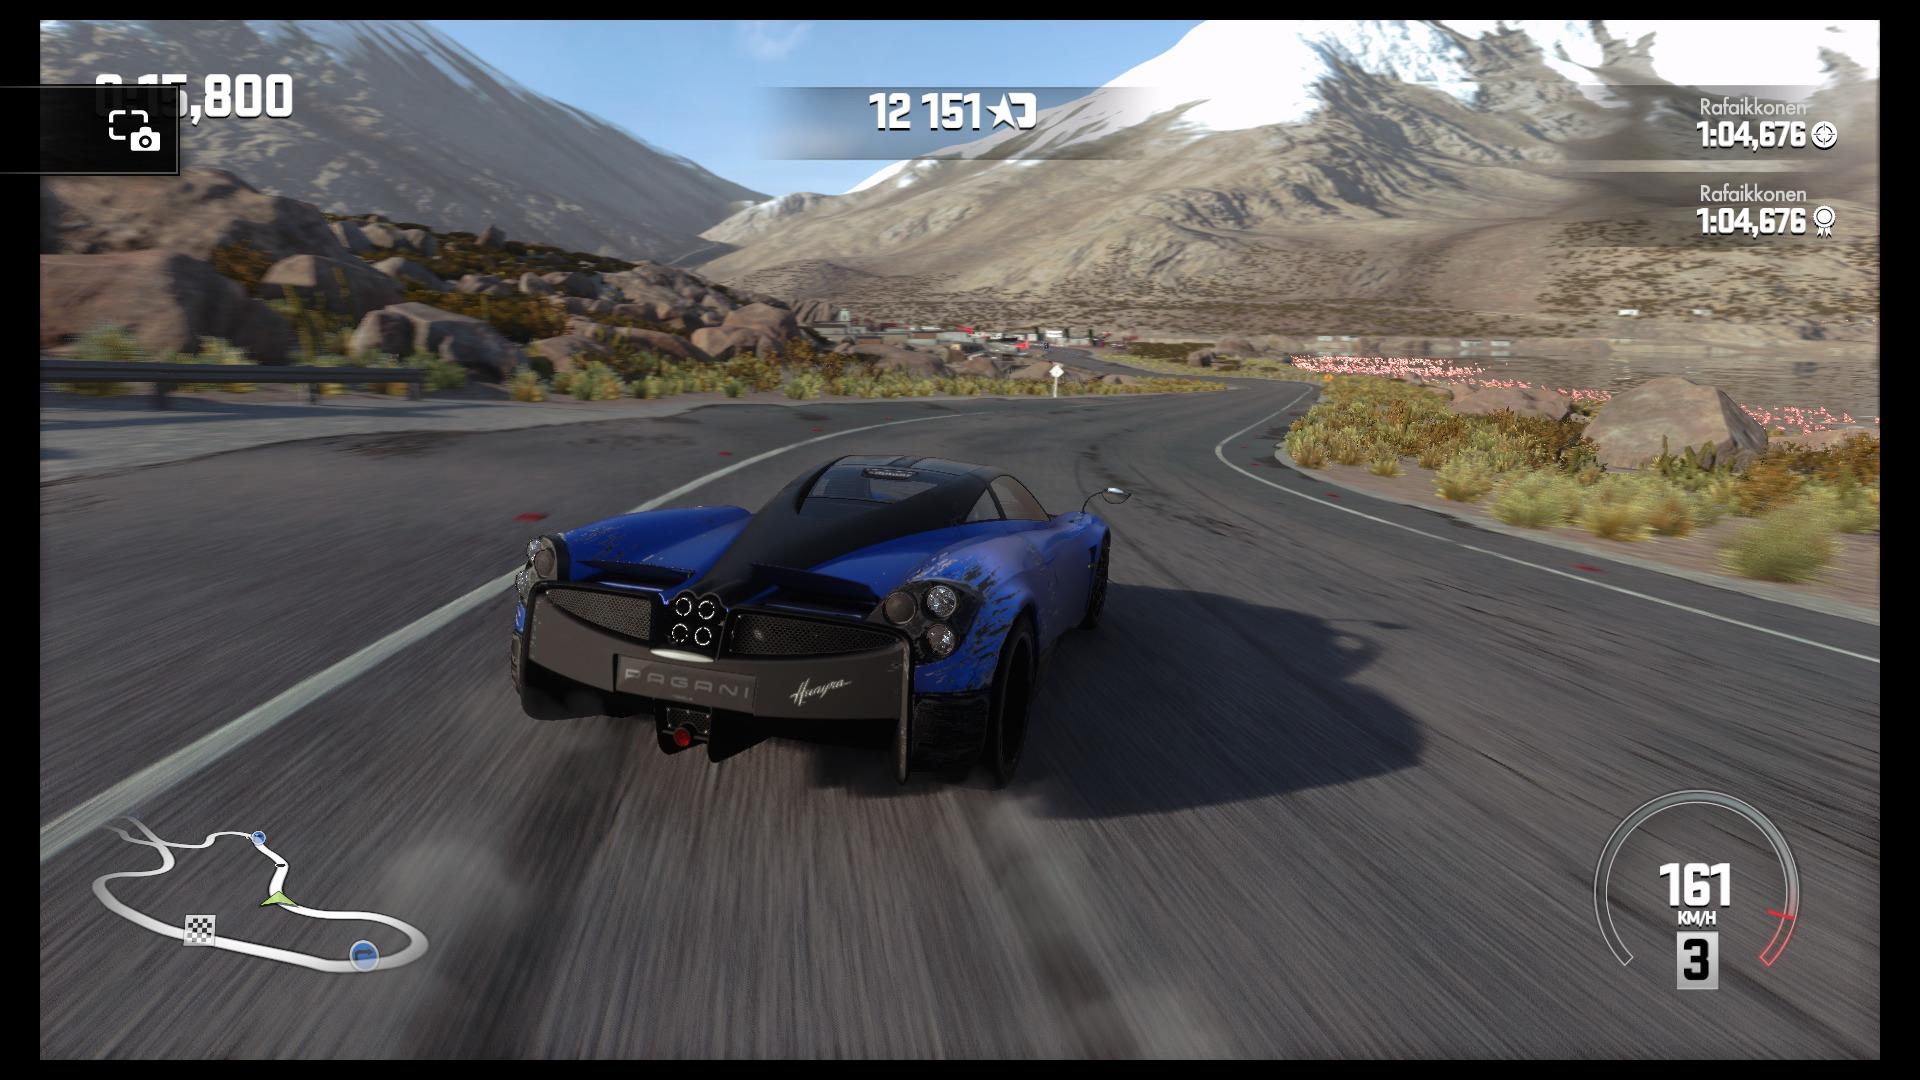 Analisis De Driveclub Para Ps4 Hobbyconsolas Juegos